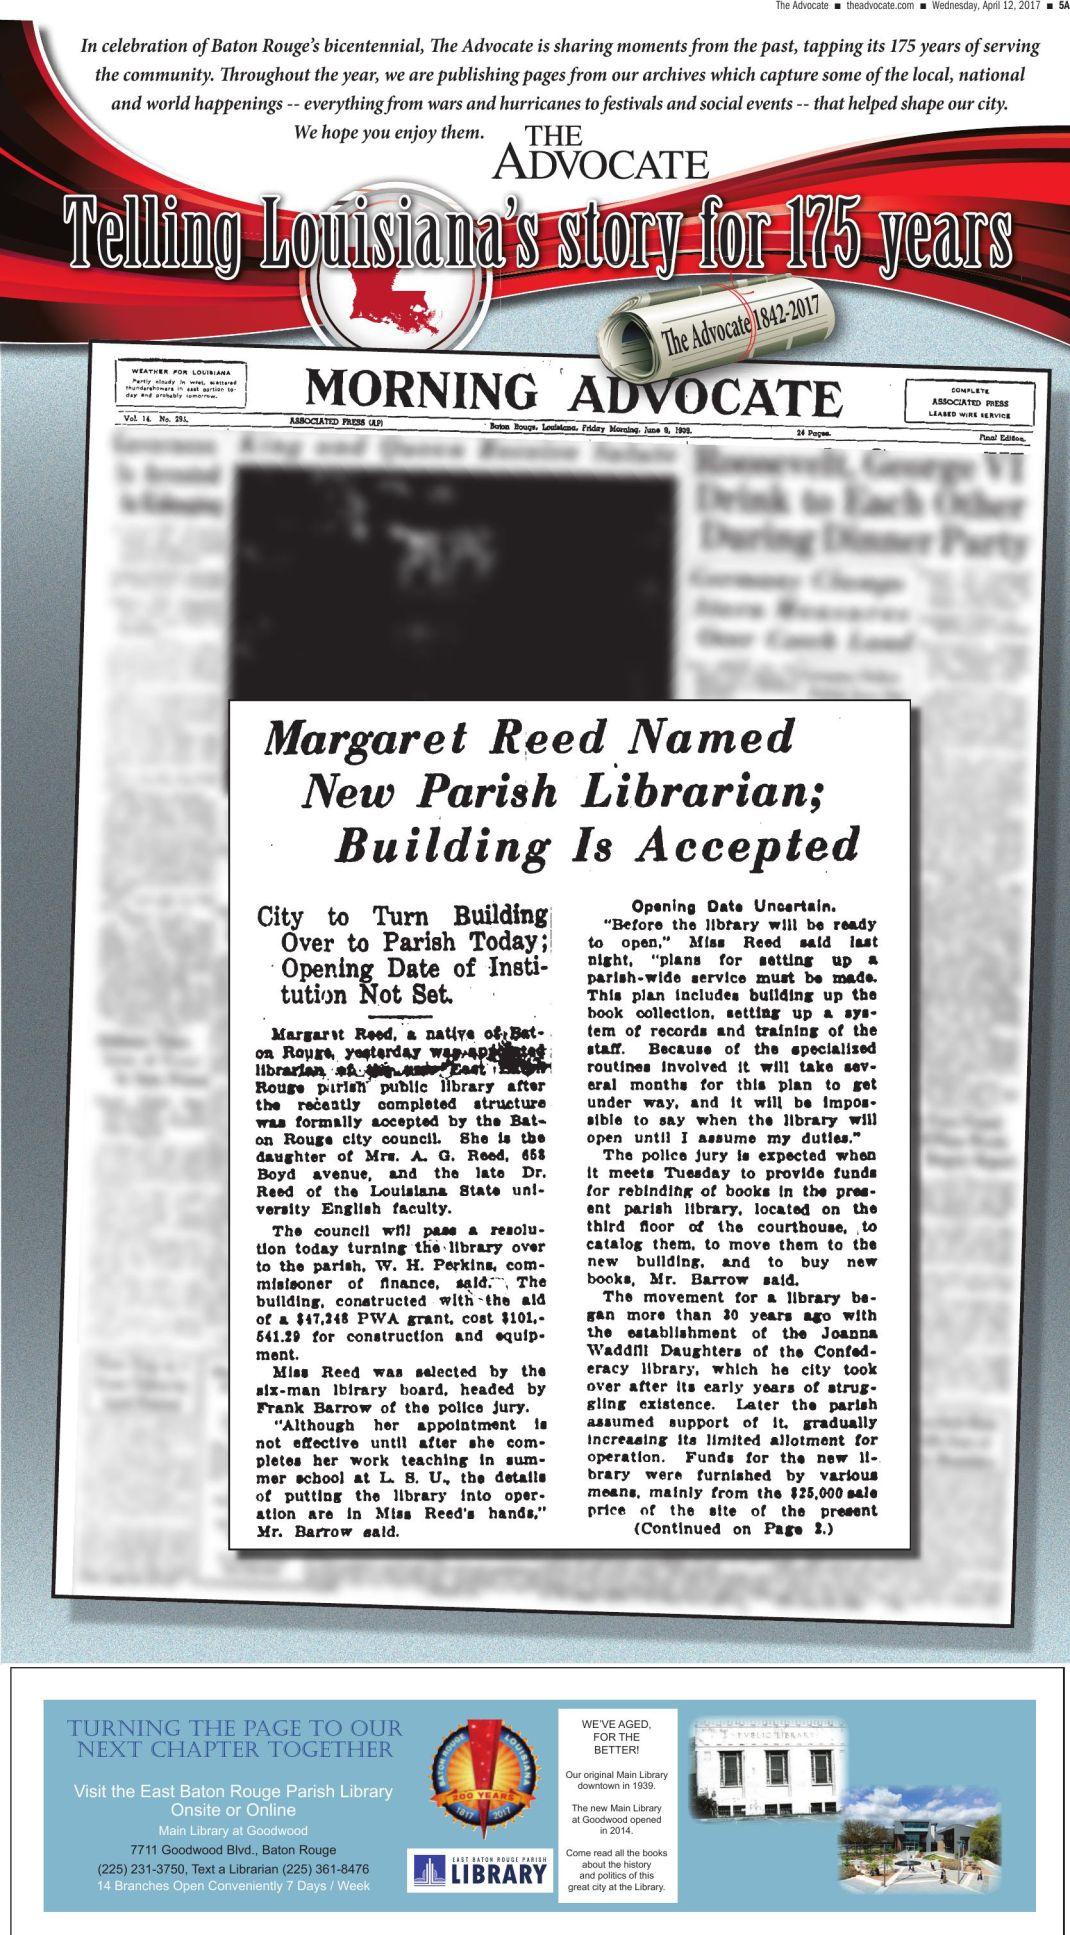 Margaret Reed named New Parish Librarian